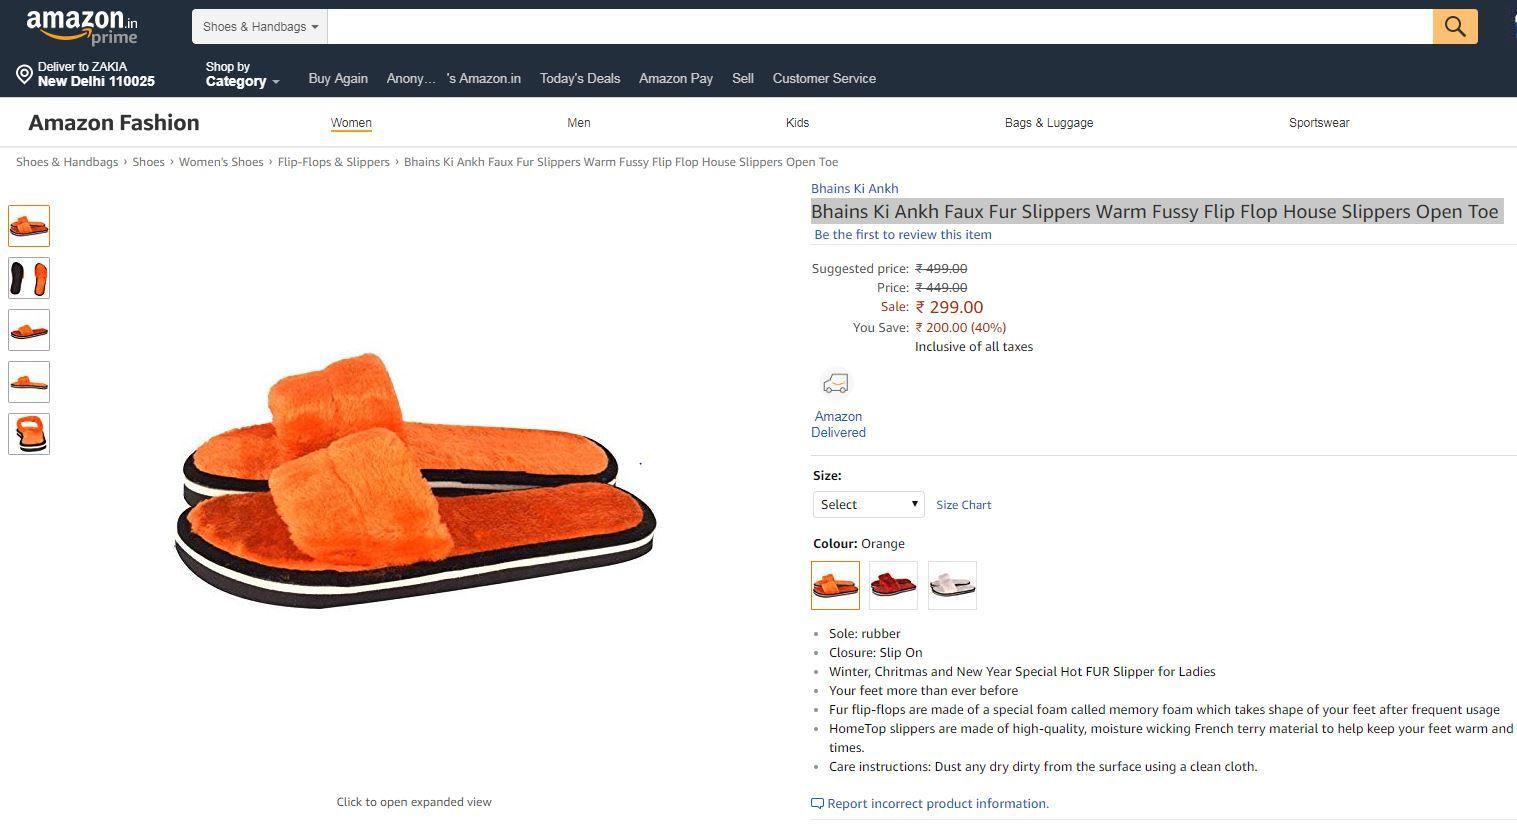 Amazon India is Selling 'Bhains Ki Ankh' Brand's Footwear